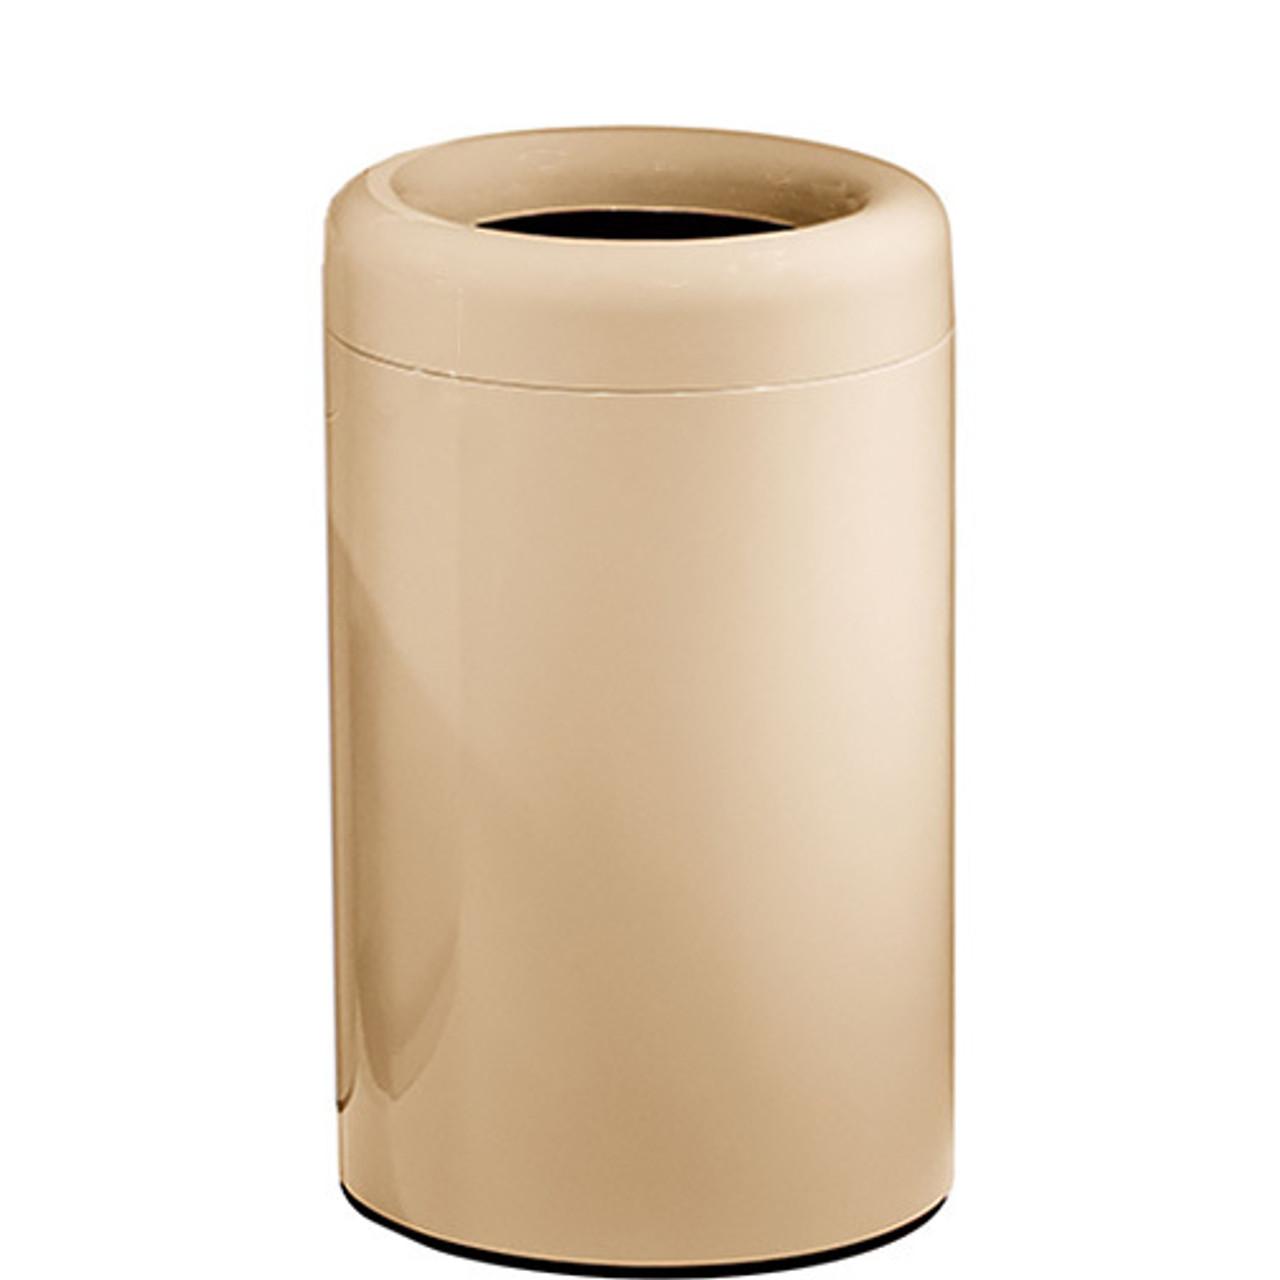 Peter Pepper Fiberglass Trash Cans